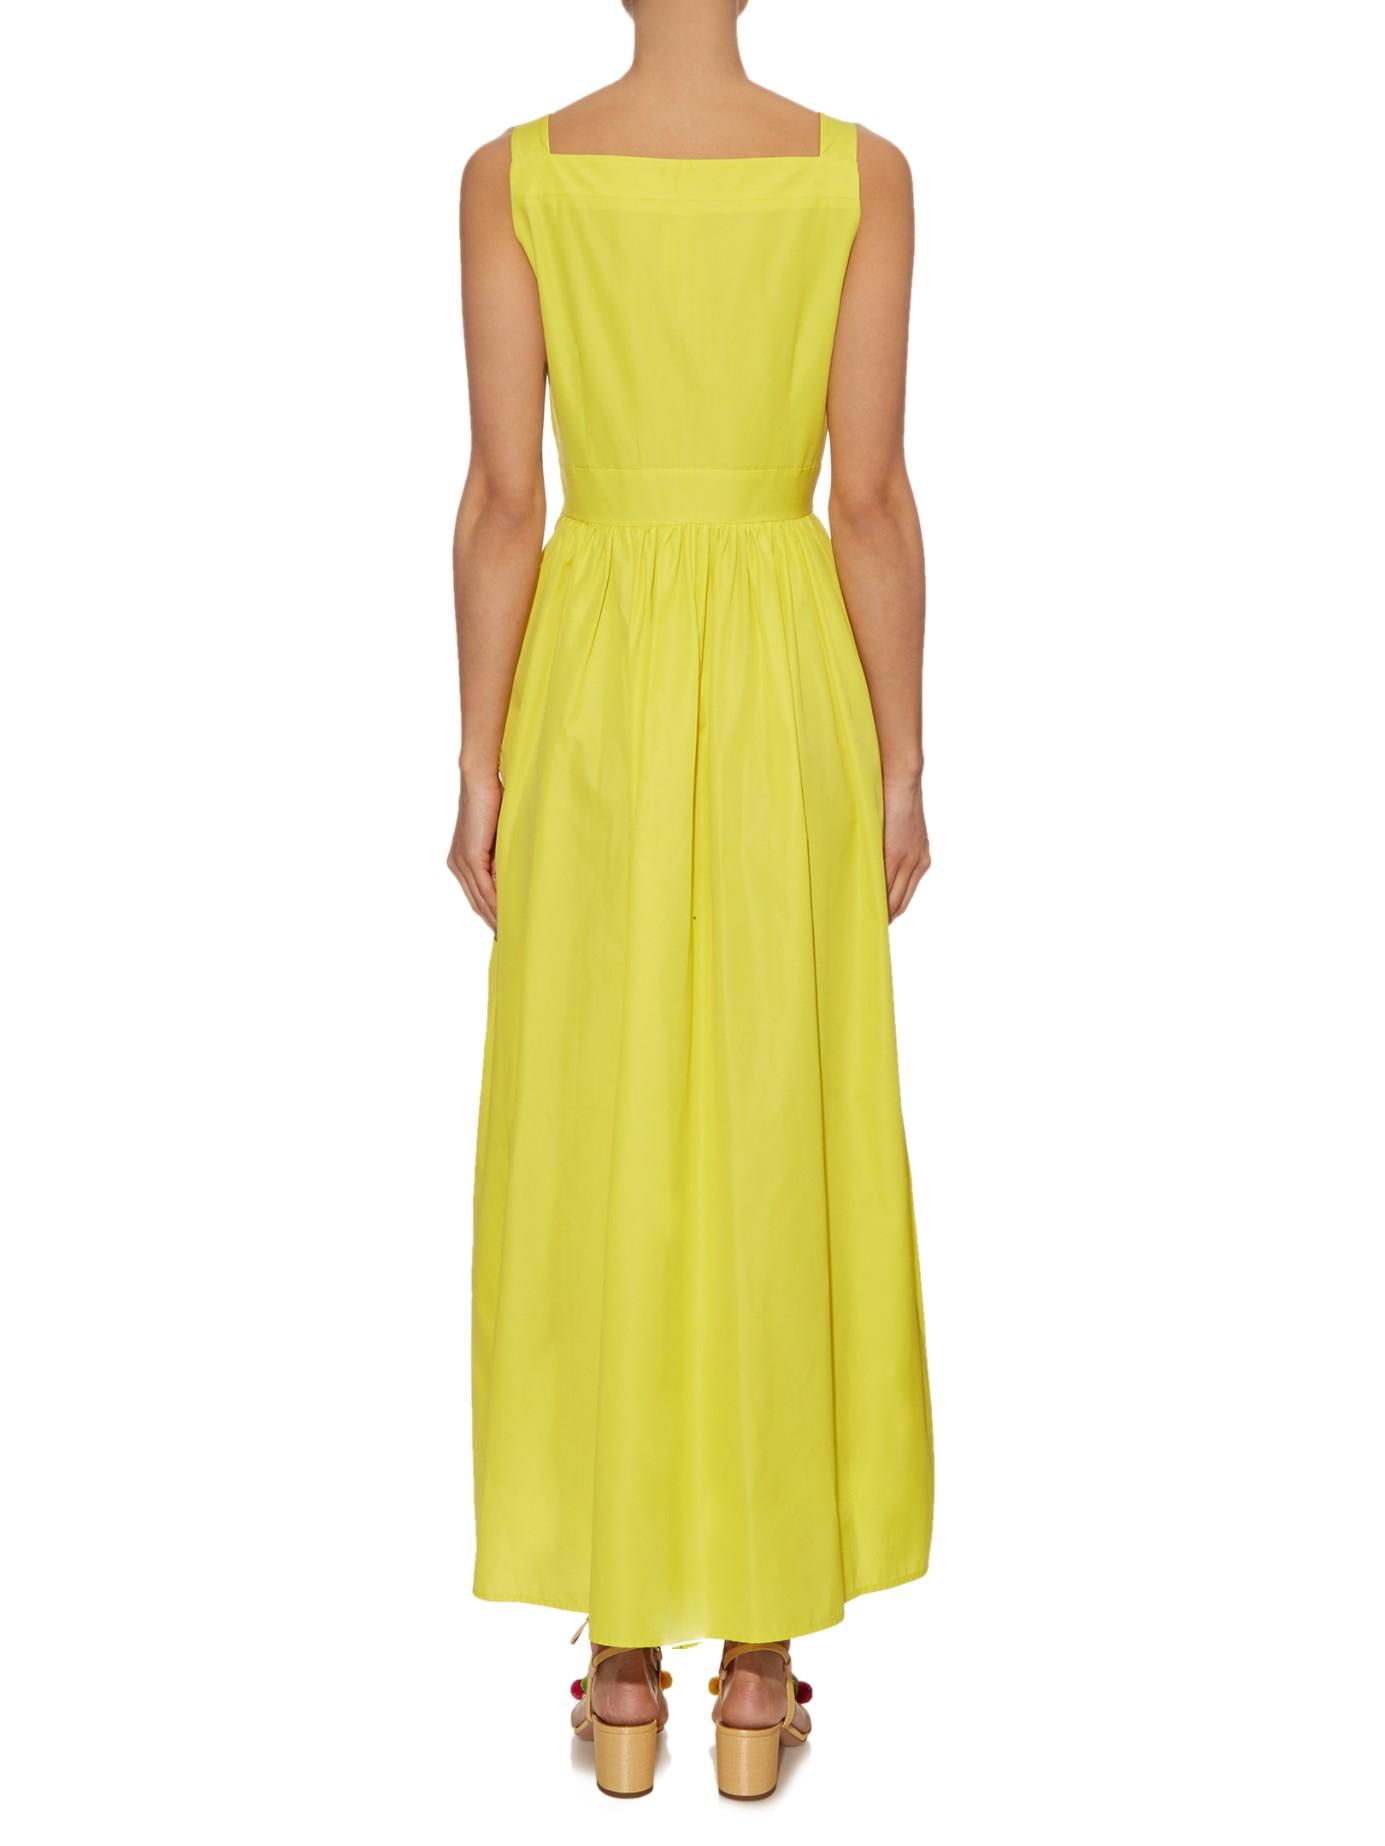 max mara studio rosa dress in yellow lyst. Black Bedroom Furniture Sets. Home Design Ideas